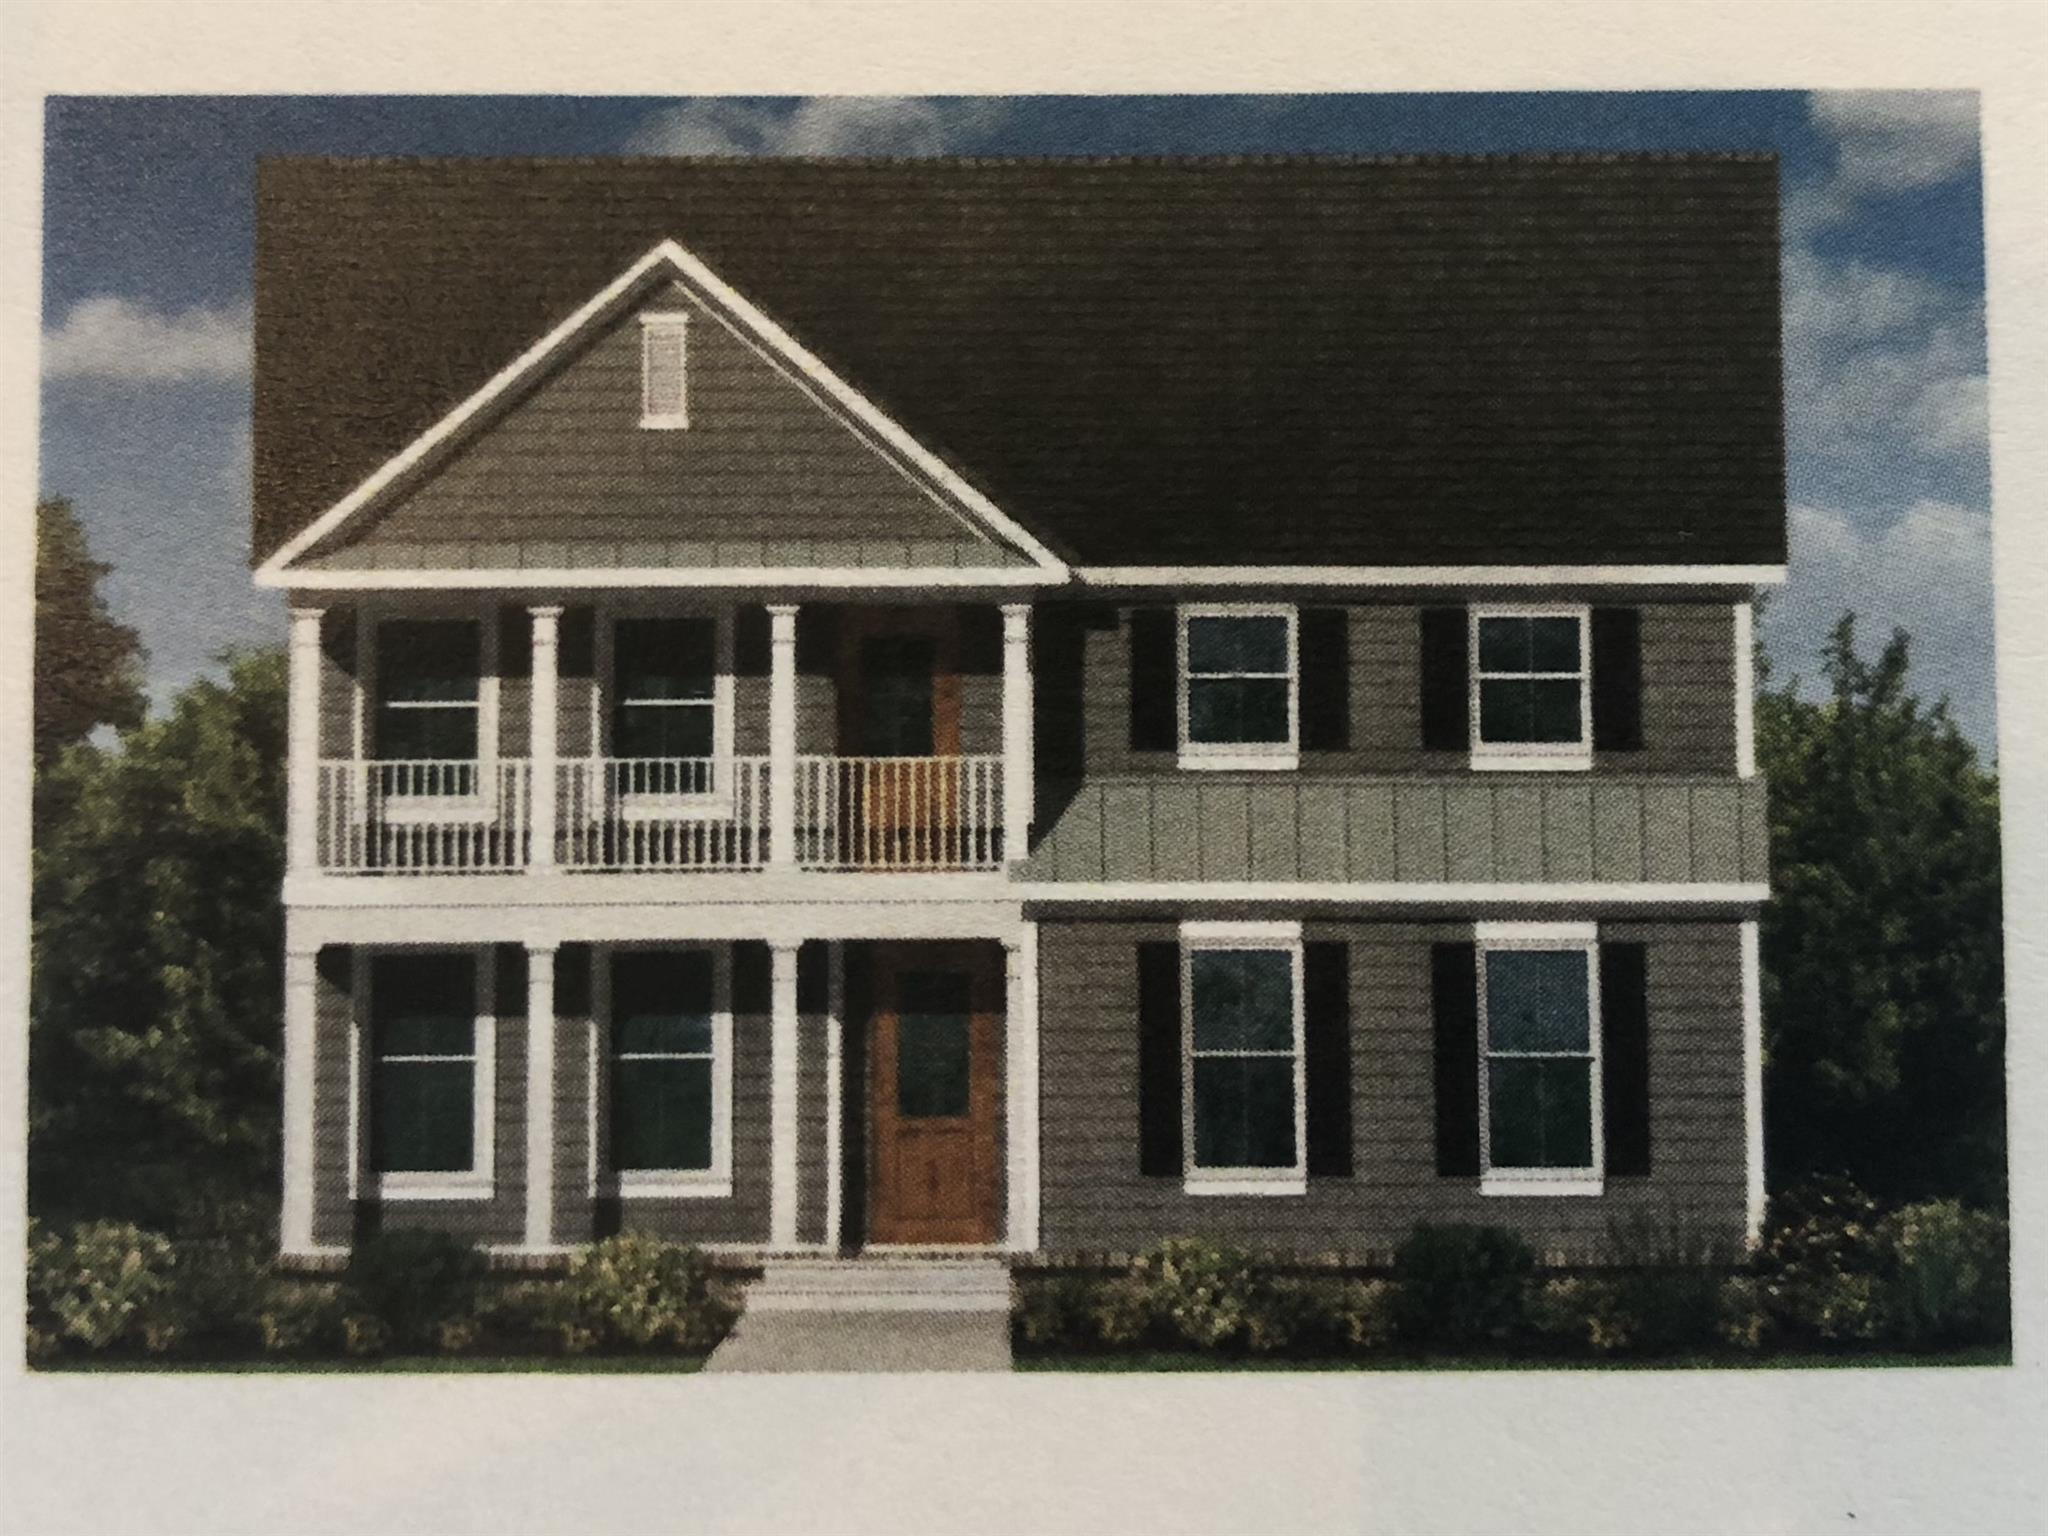 3319 Chinoe Drive- LOT 87, Murfreesboro, TN 37129 - Murfreesboro, TN real estate listing